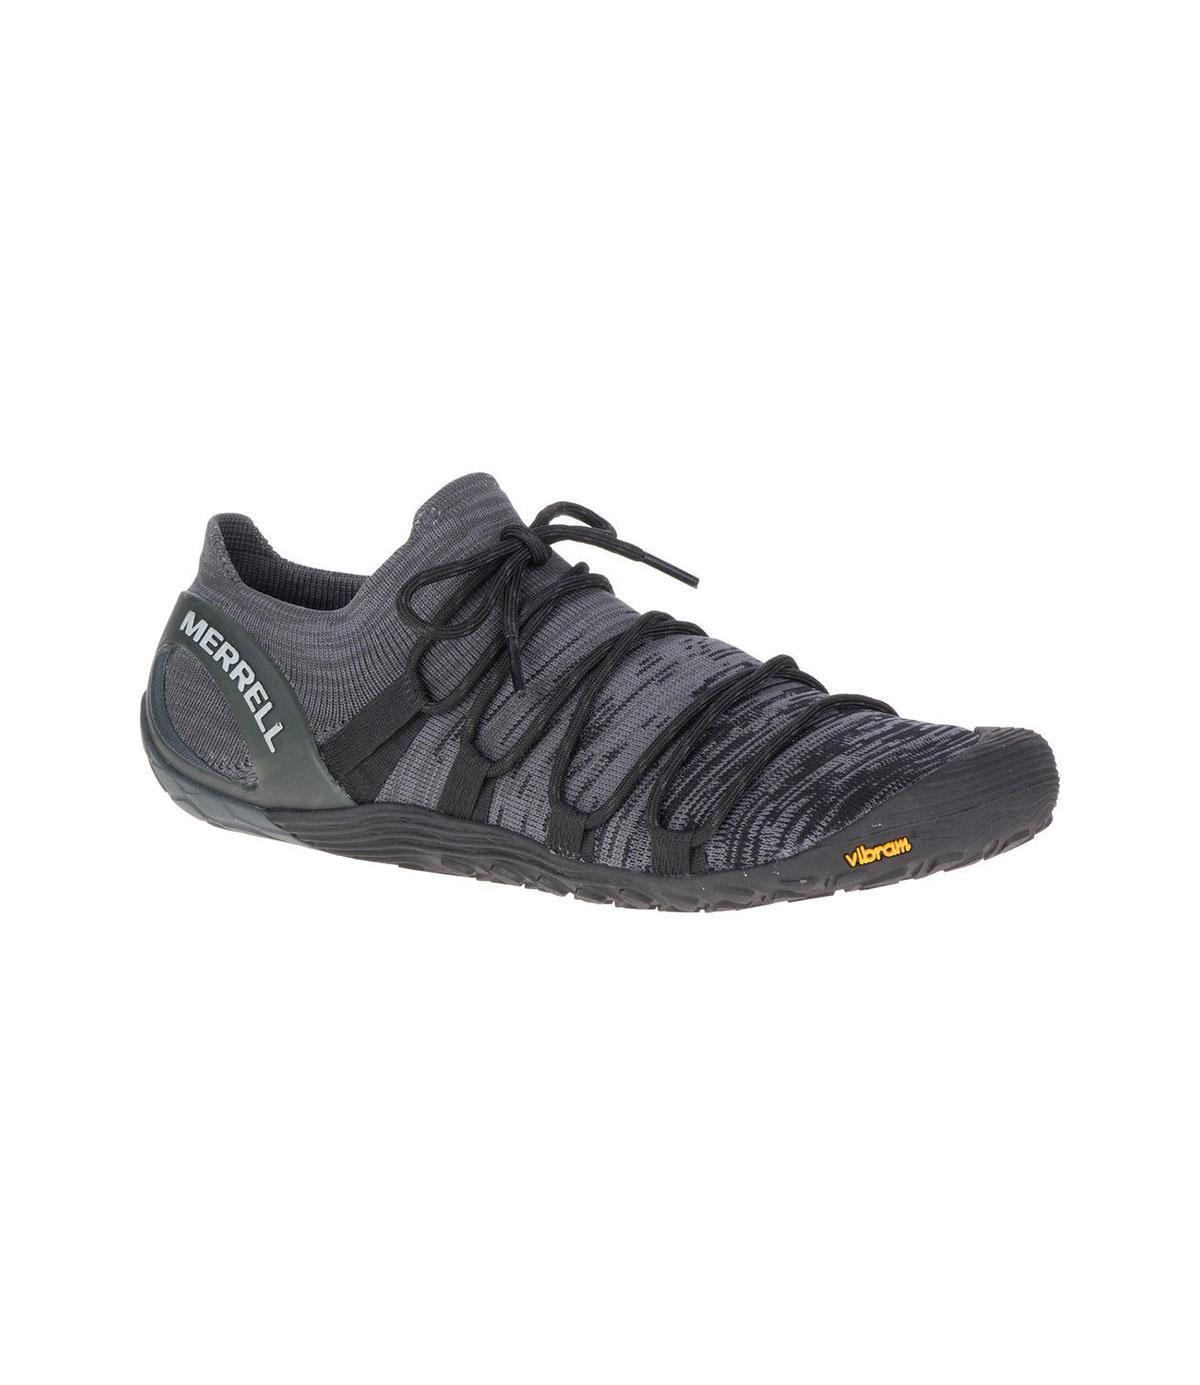 Merrell vapor glove 4 3 d black j 50323